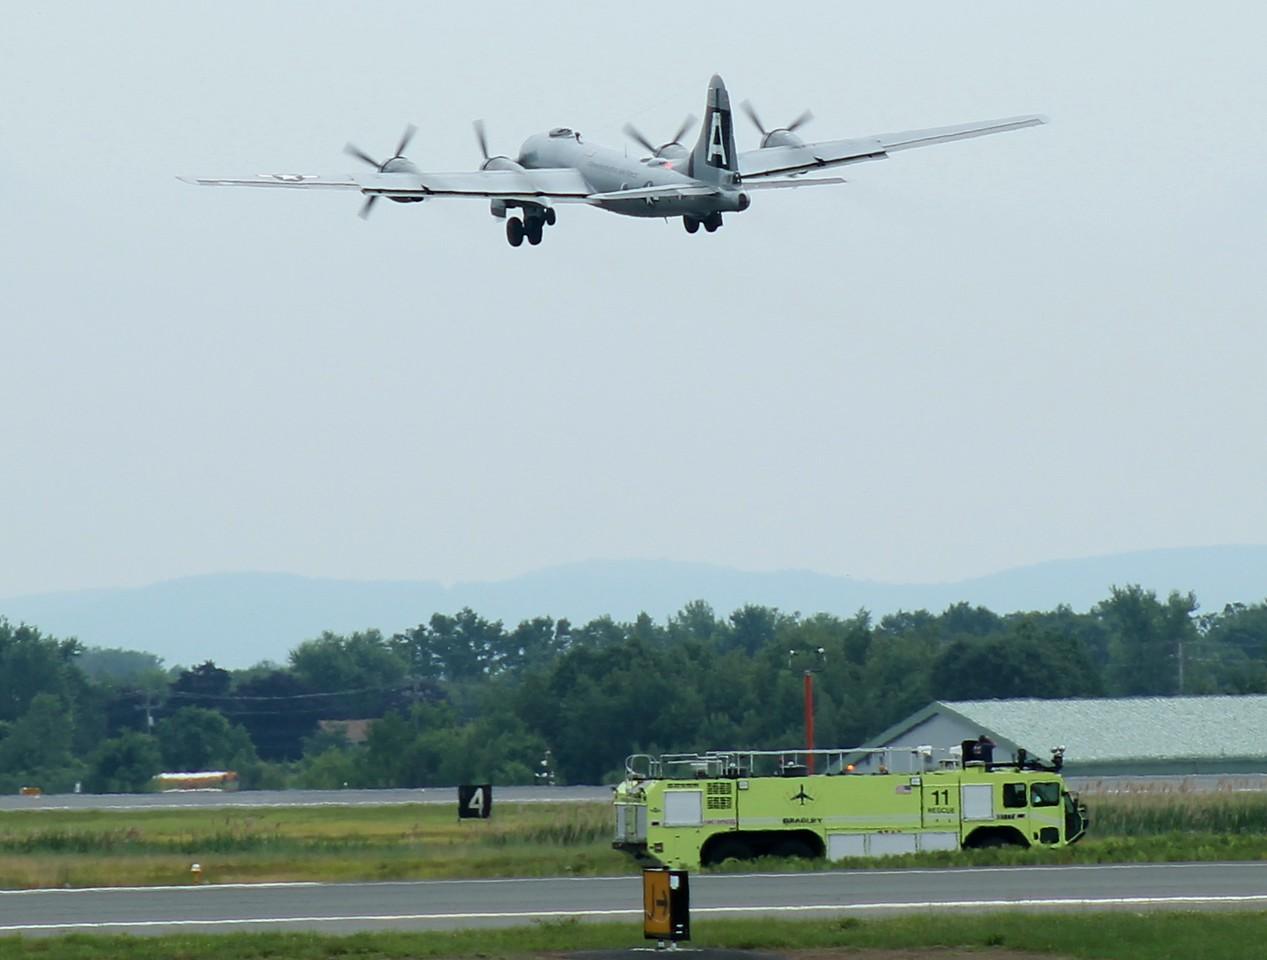 Commemorative Air Force B-29 Superfortress 'FIFI' departing rwy6 at KBDL